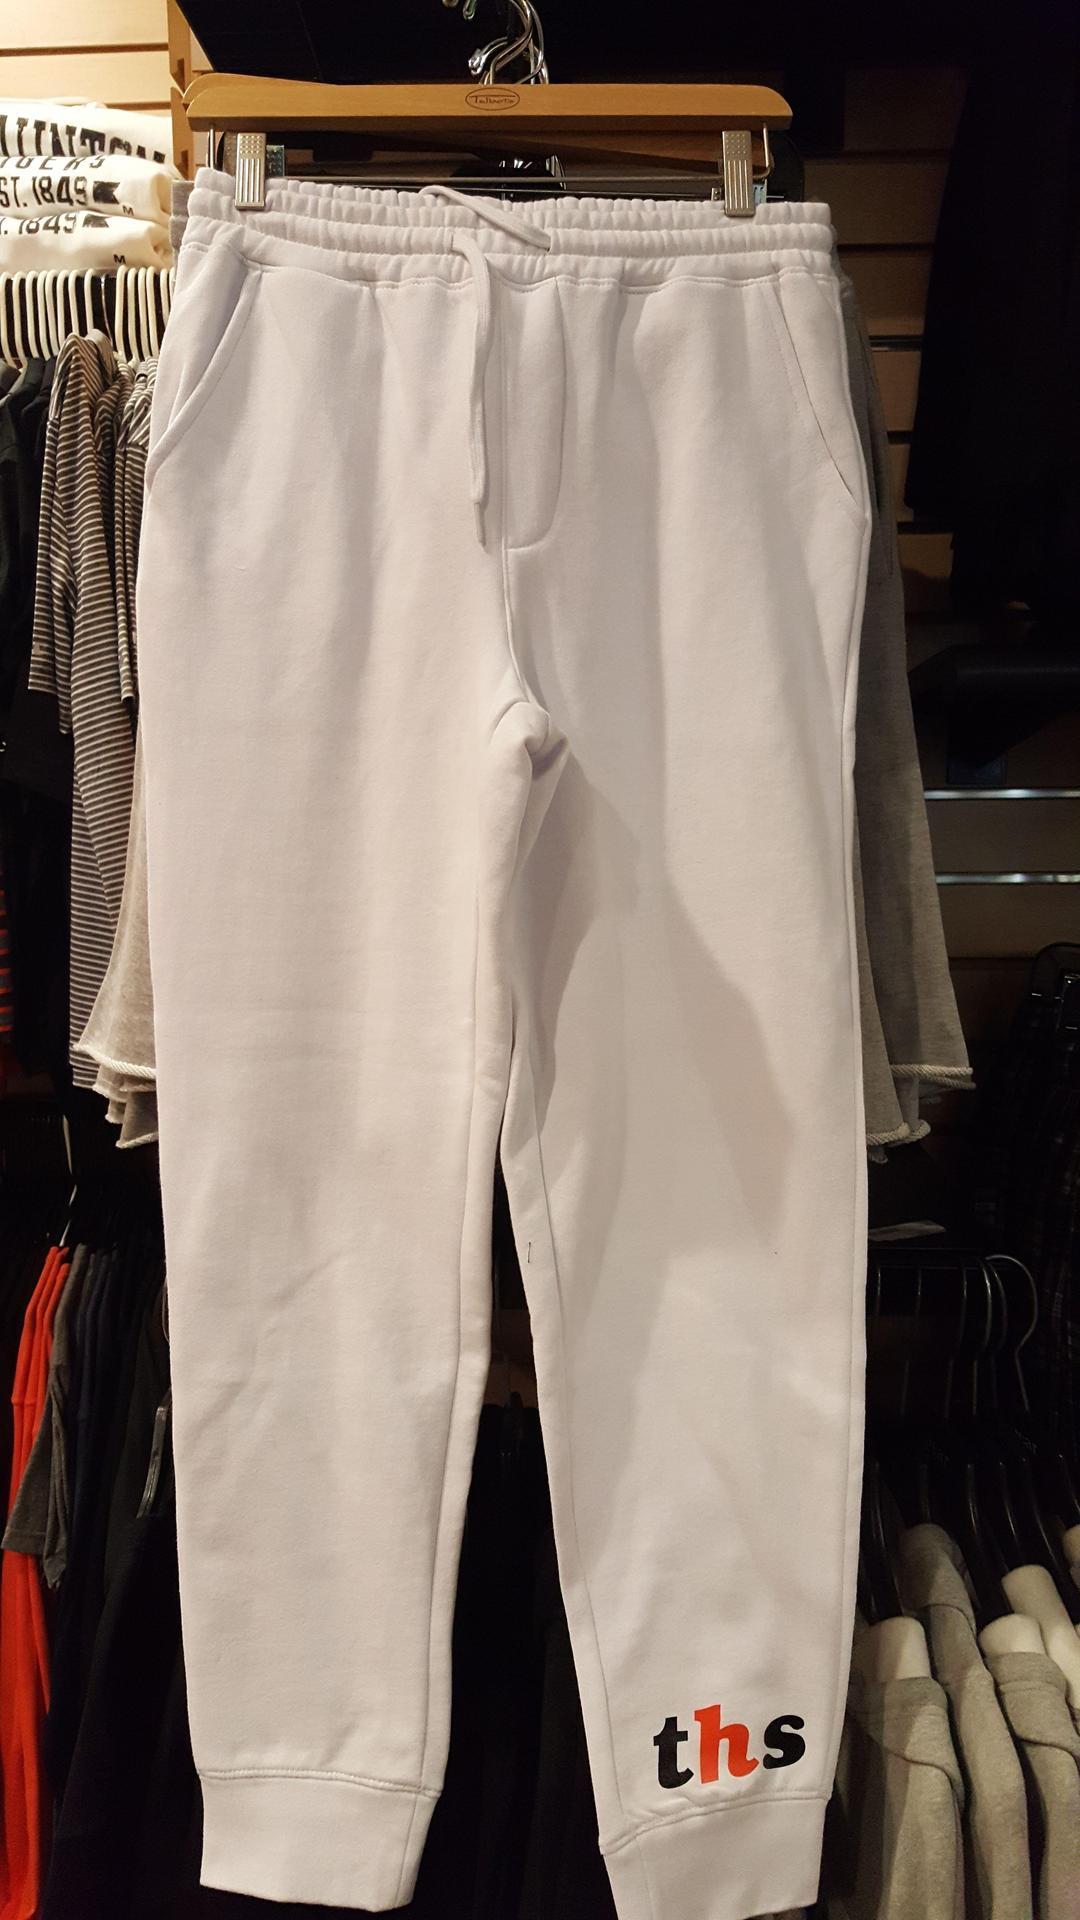 $35.00   White Cotton Joggers  Unisex  SMall Thurs XXL